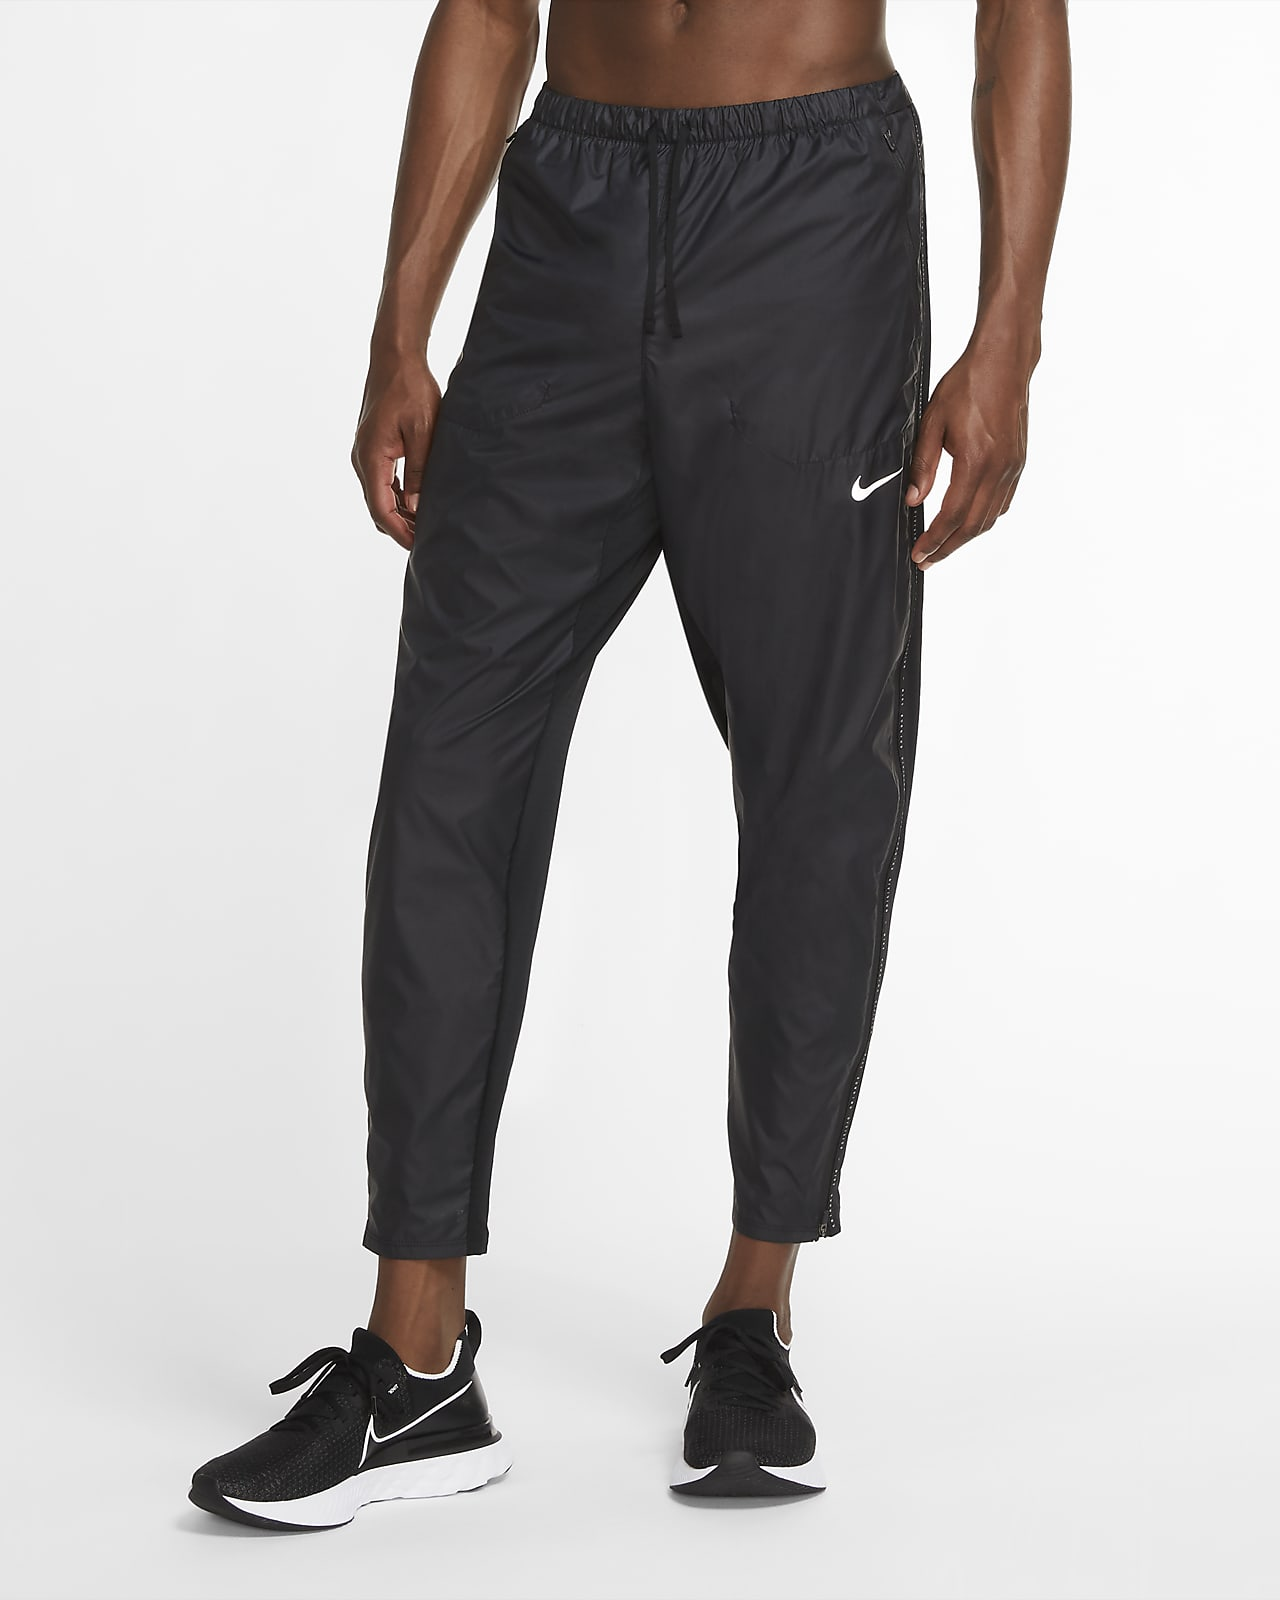 Nike Phenom Elite Shield Run Division Pantalón de running - Hombre